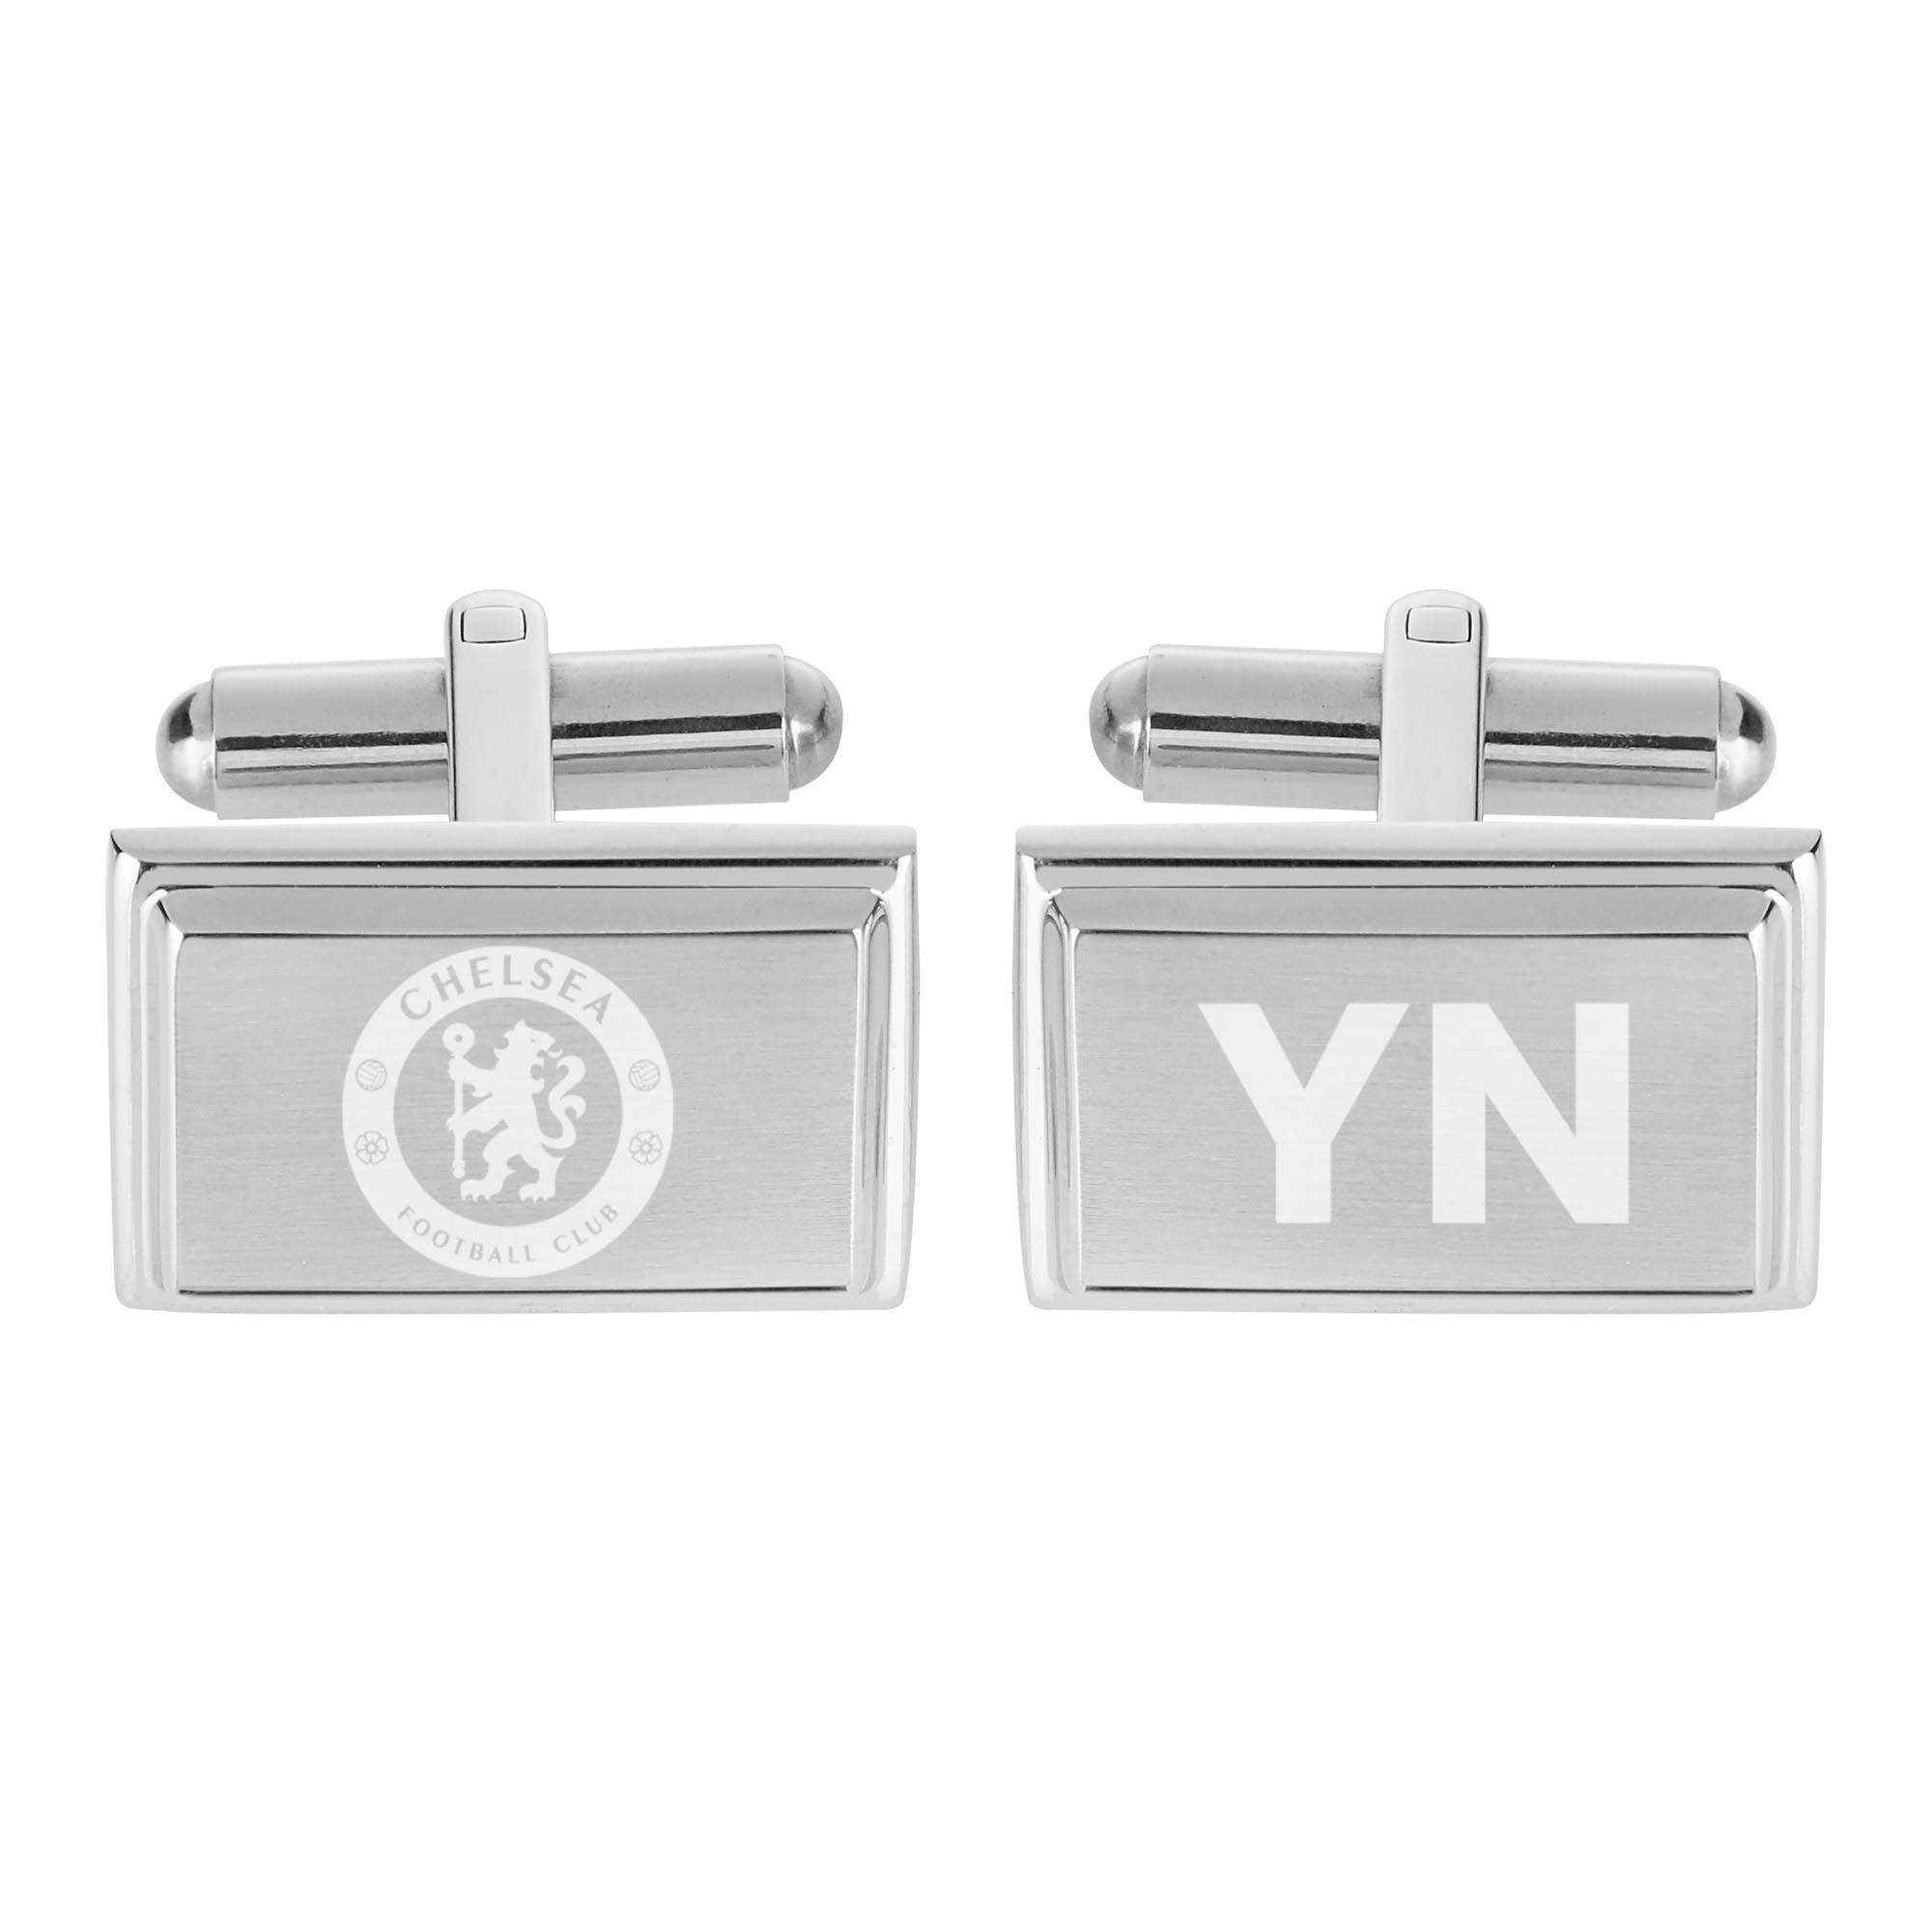 Chelsea FC Crest Cufflinks